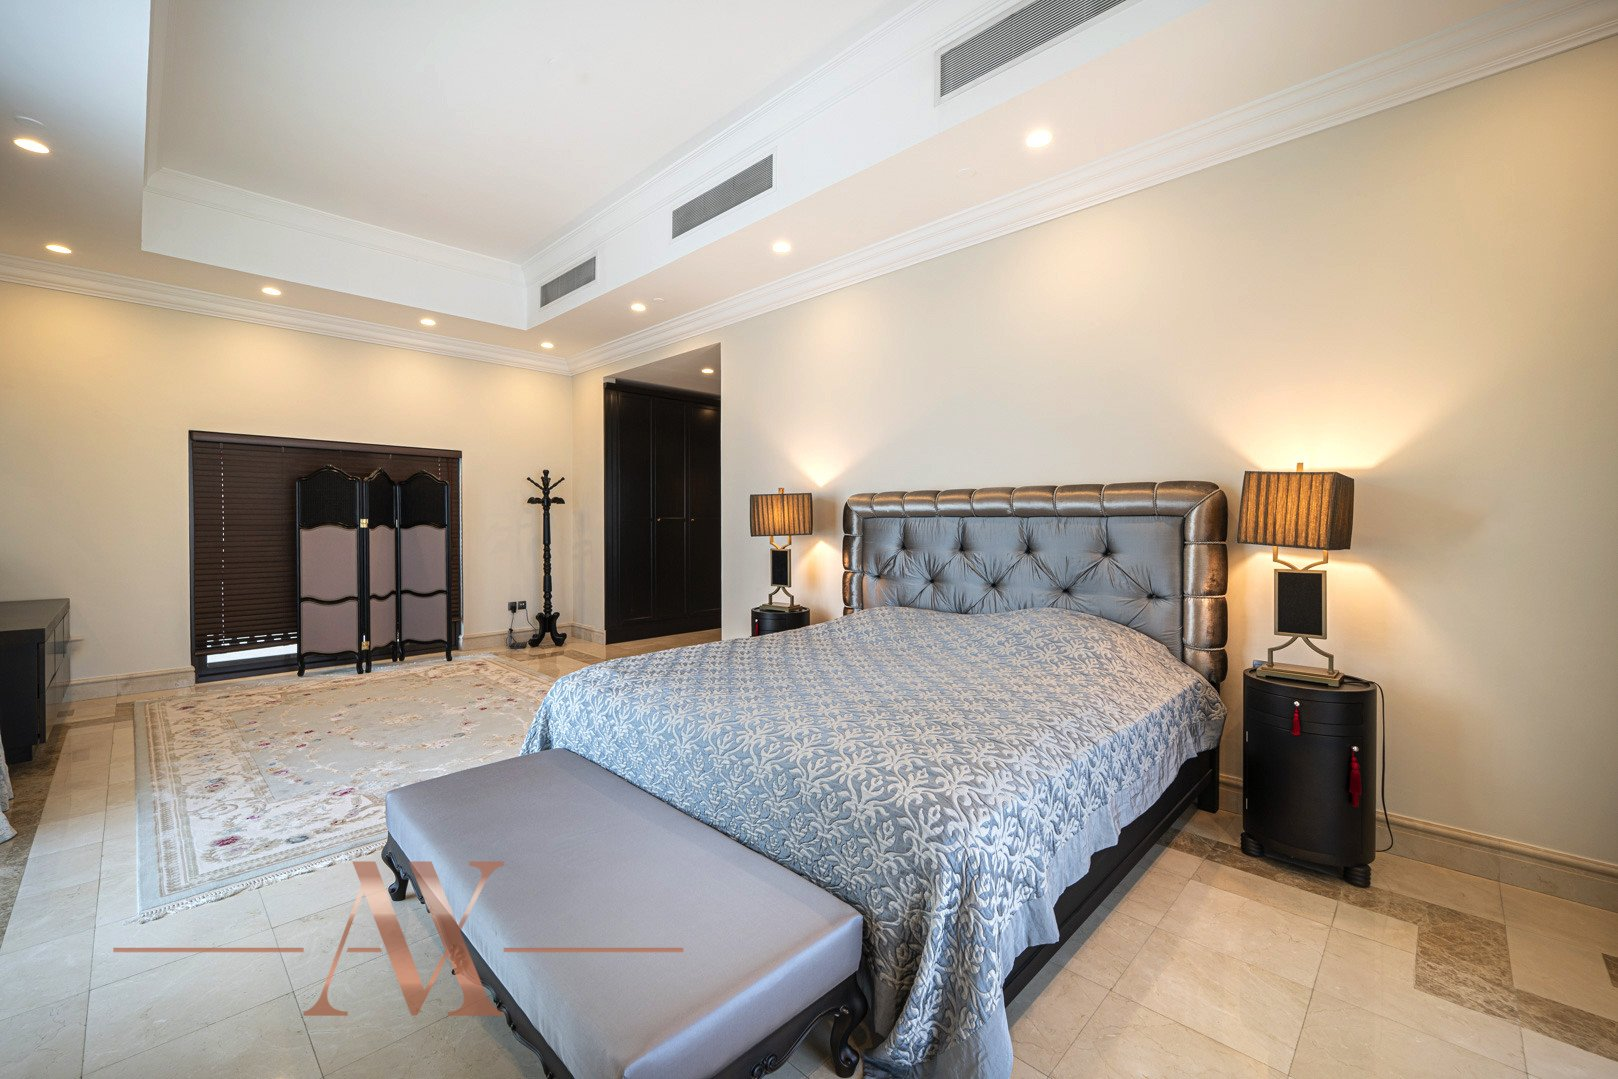 Penthouse for sale in Dubai, UAE, 5 bedrooms, 1057 m2, No. 23747 – photo 13